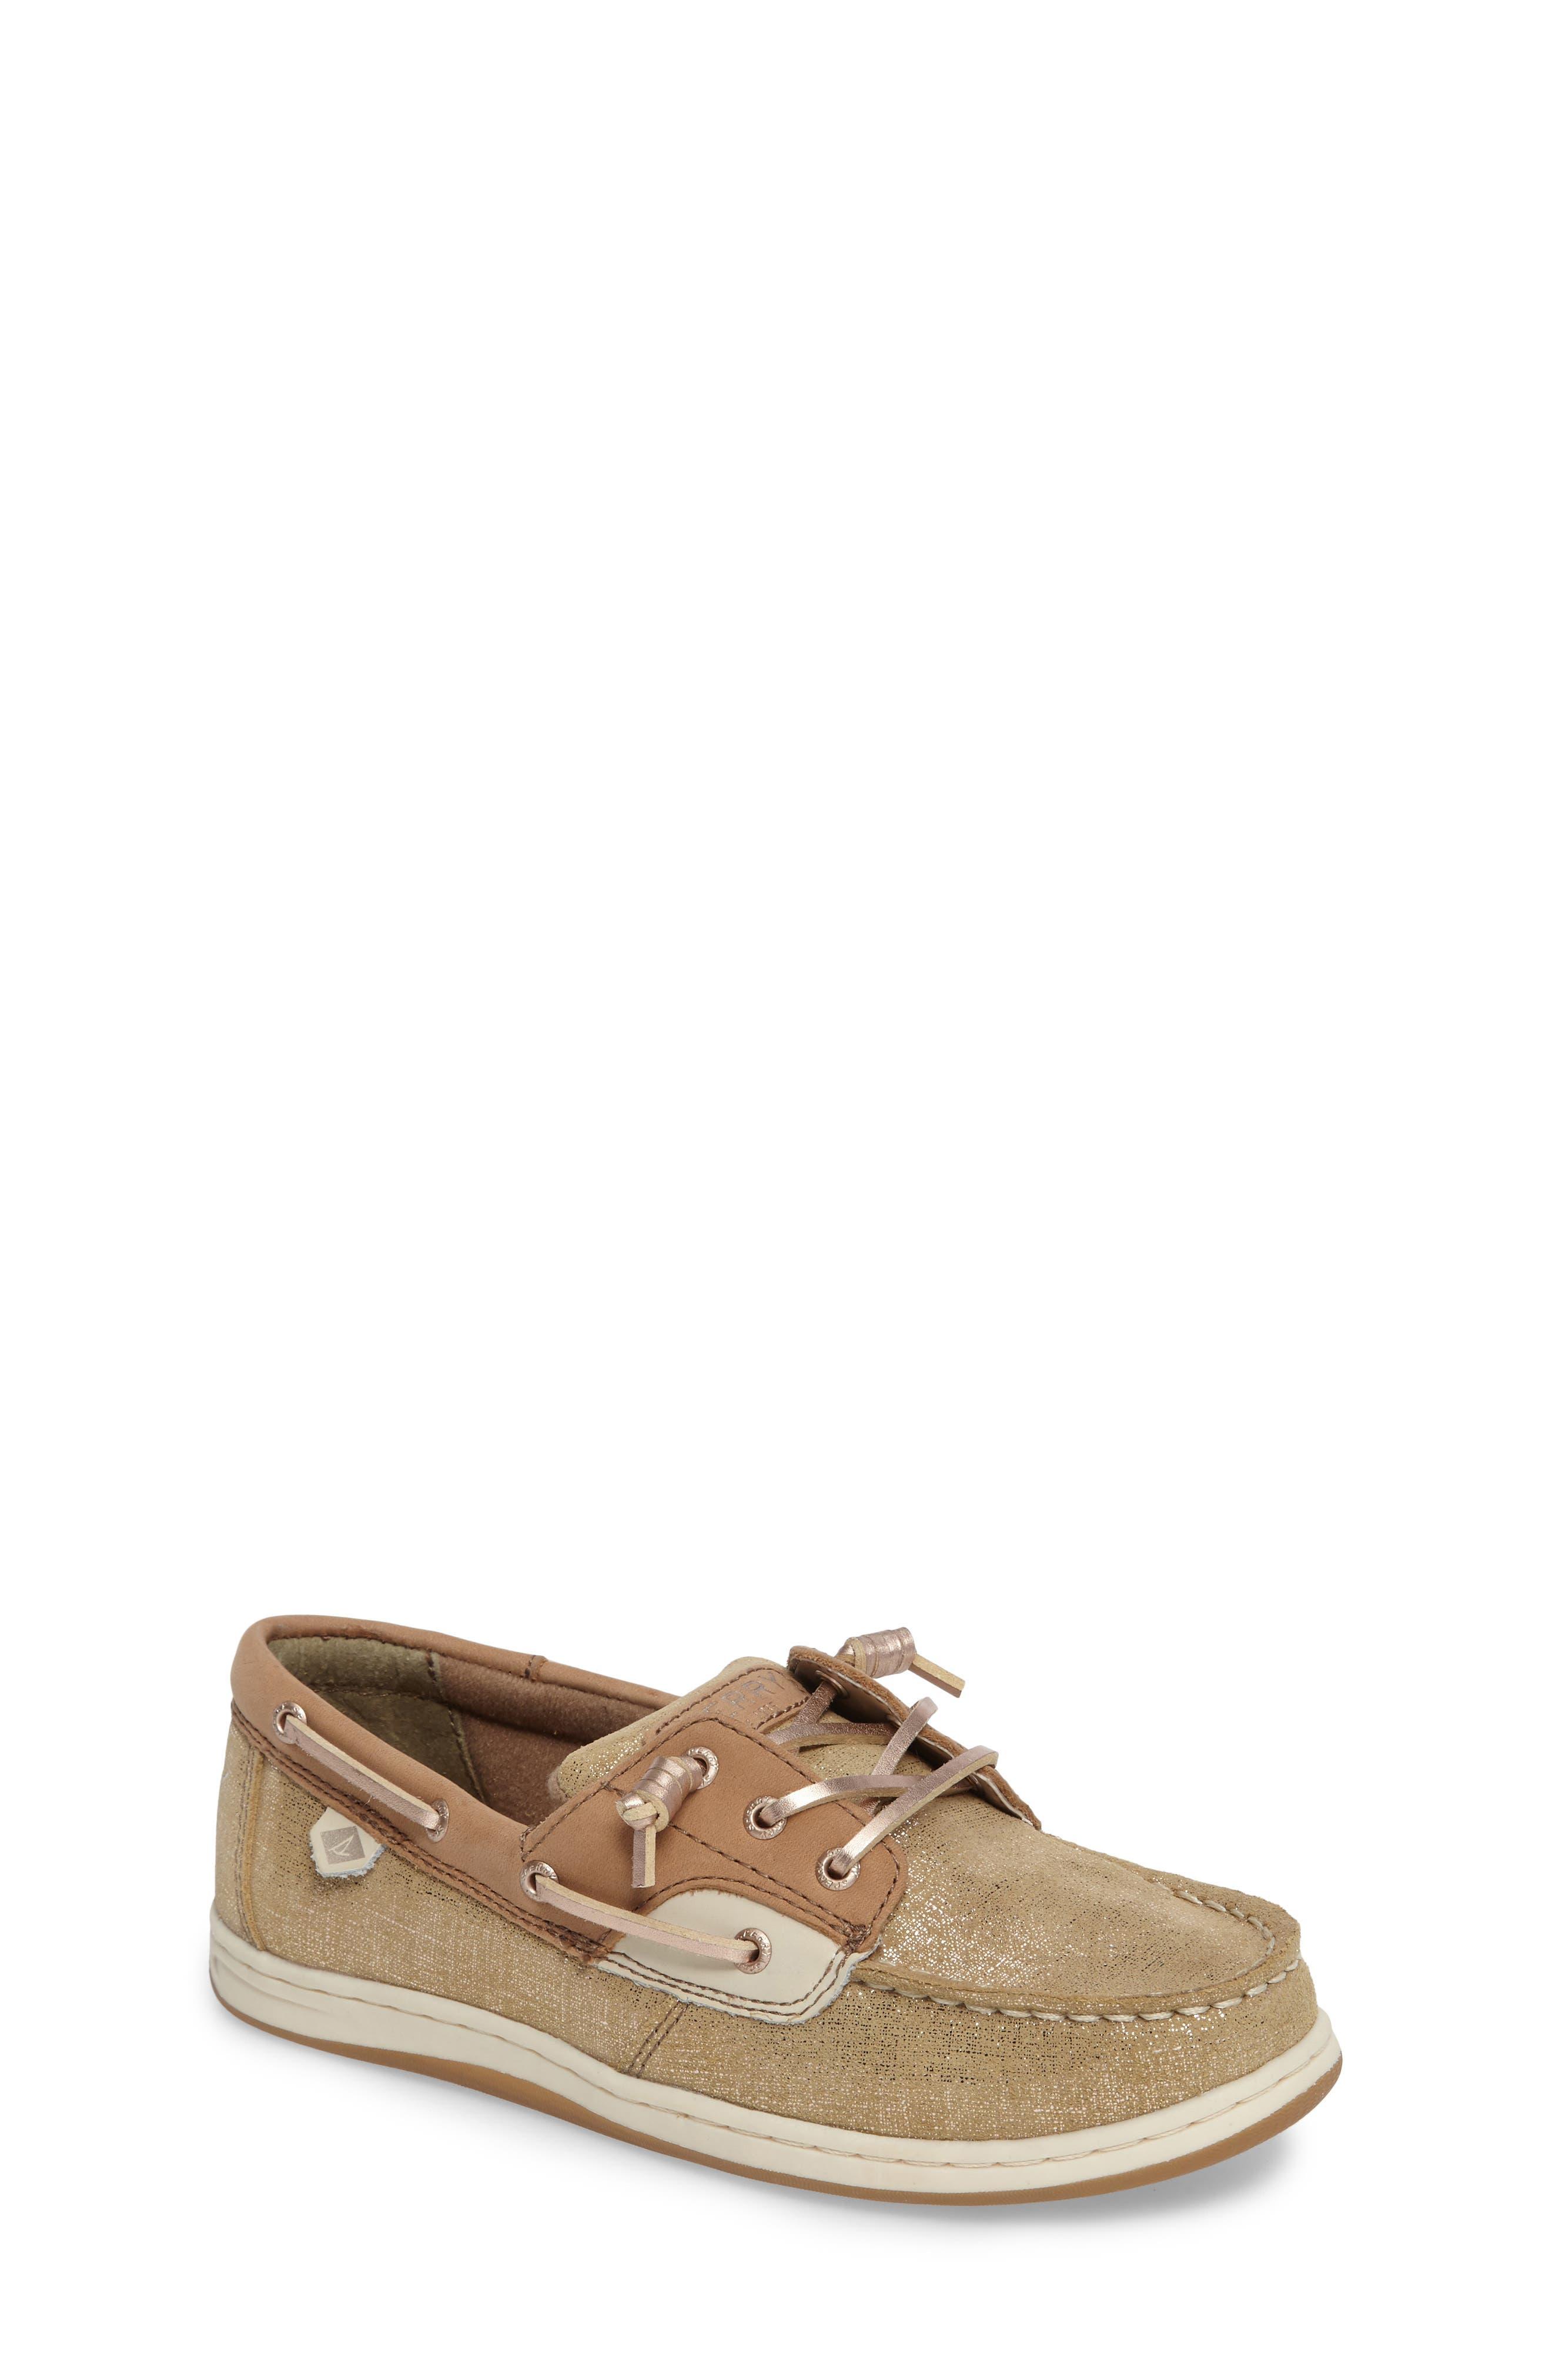 'Songfish' Boat Shoe,                             Main thumbnail 1, color,                             Linen/ Gold